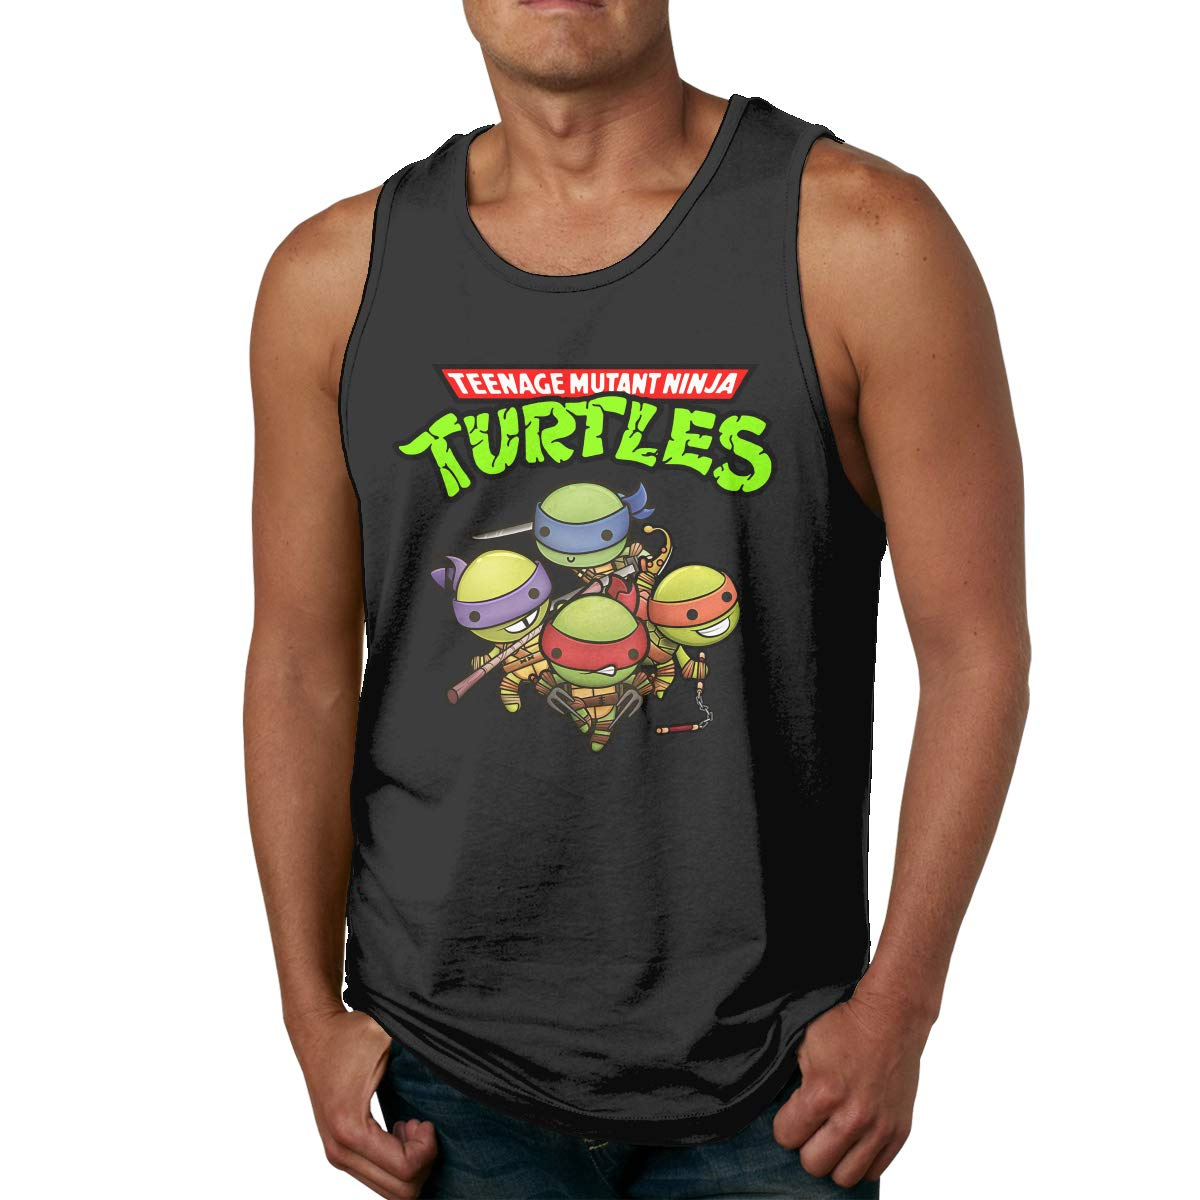 JChesterton Teenage Mutant Ninja Turtles Group Mens Tank Top T-Shirt Black